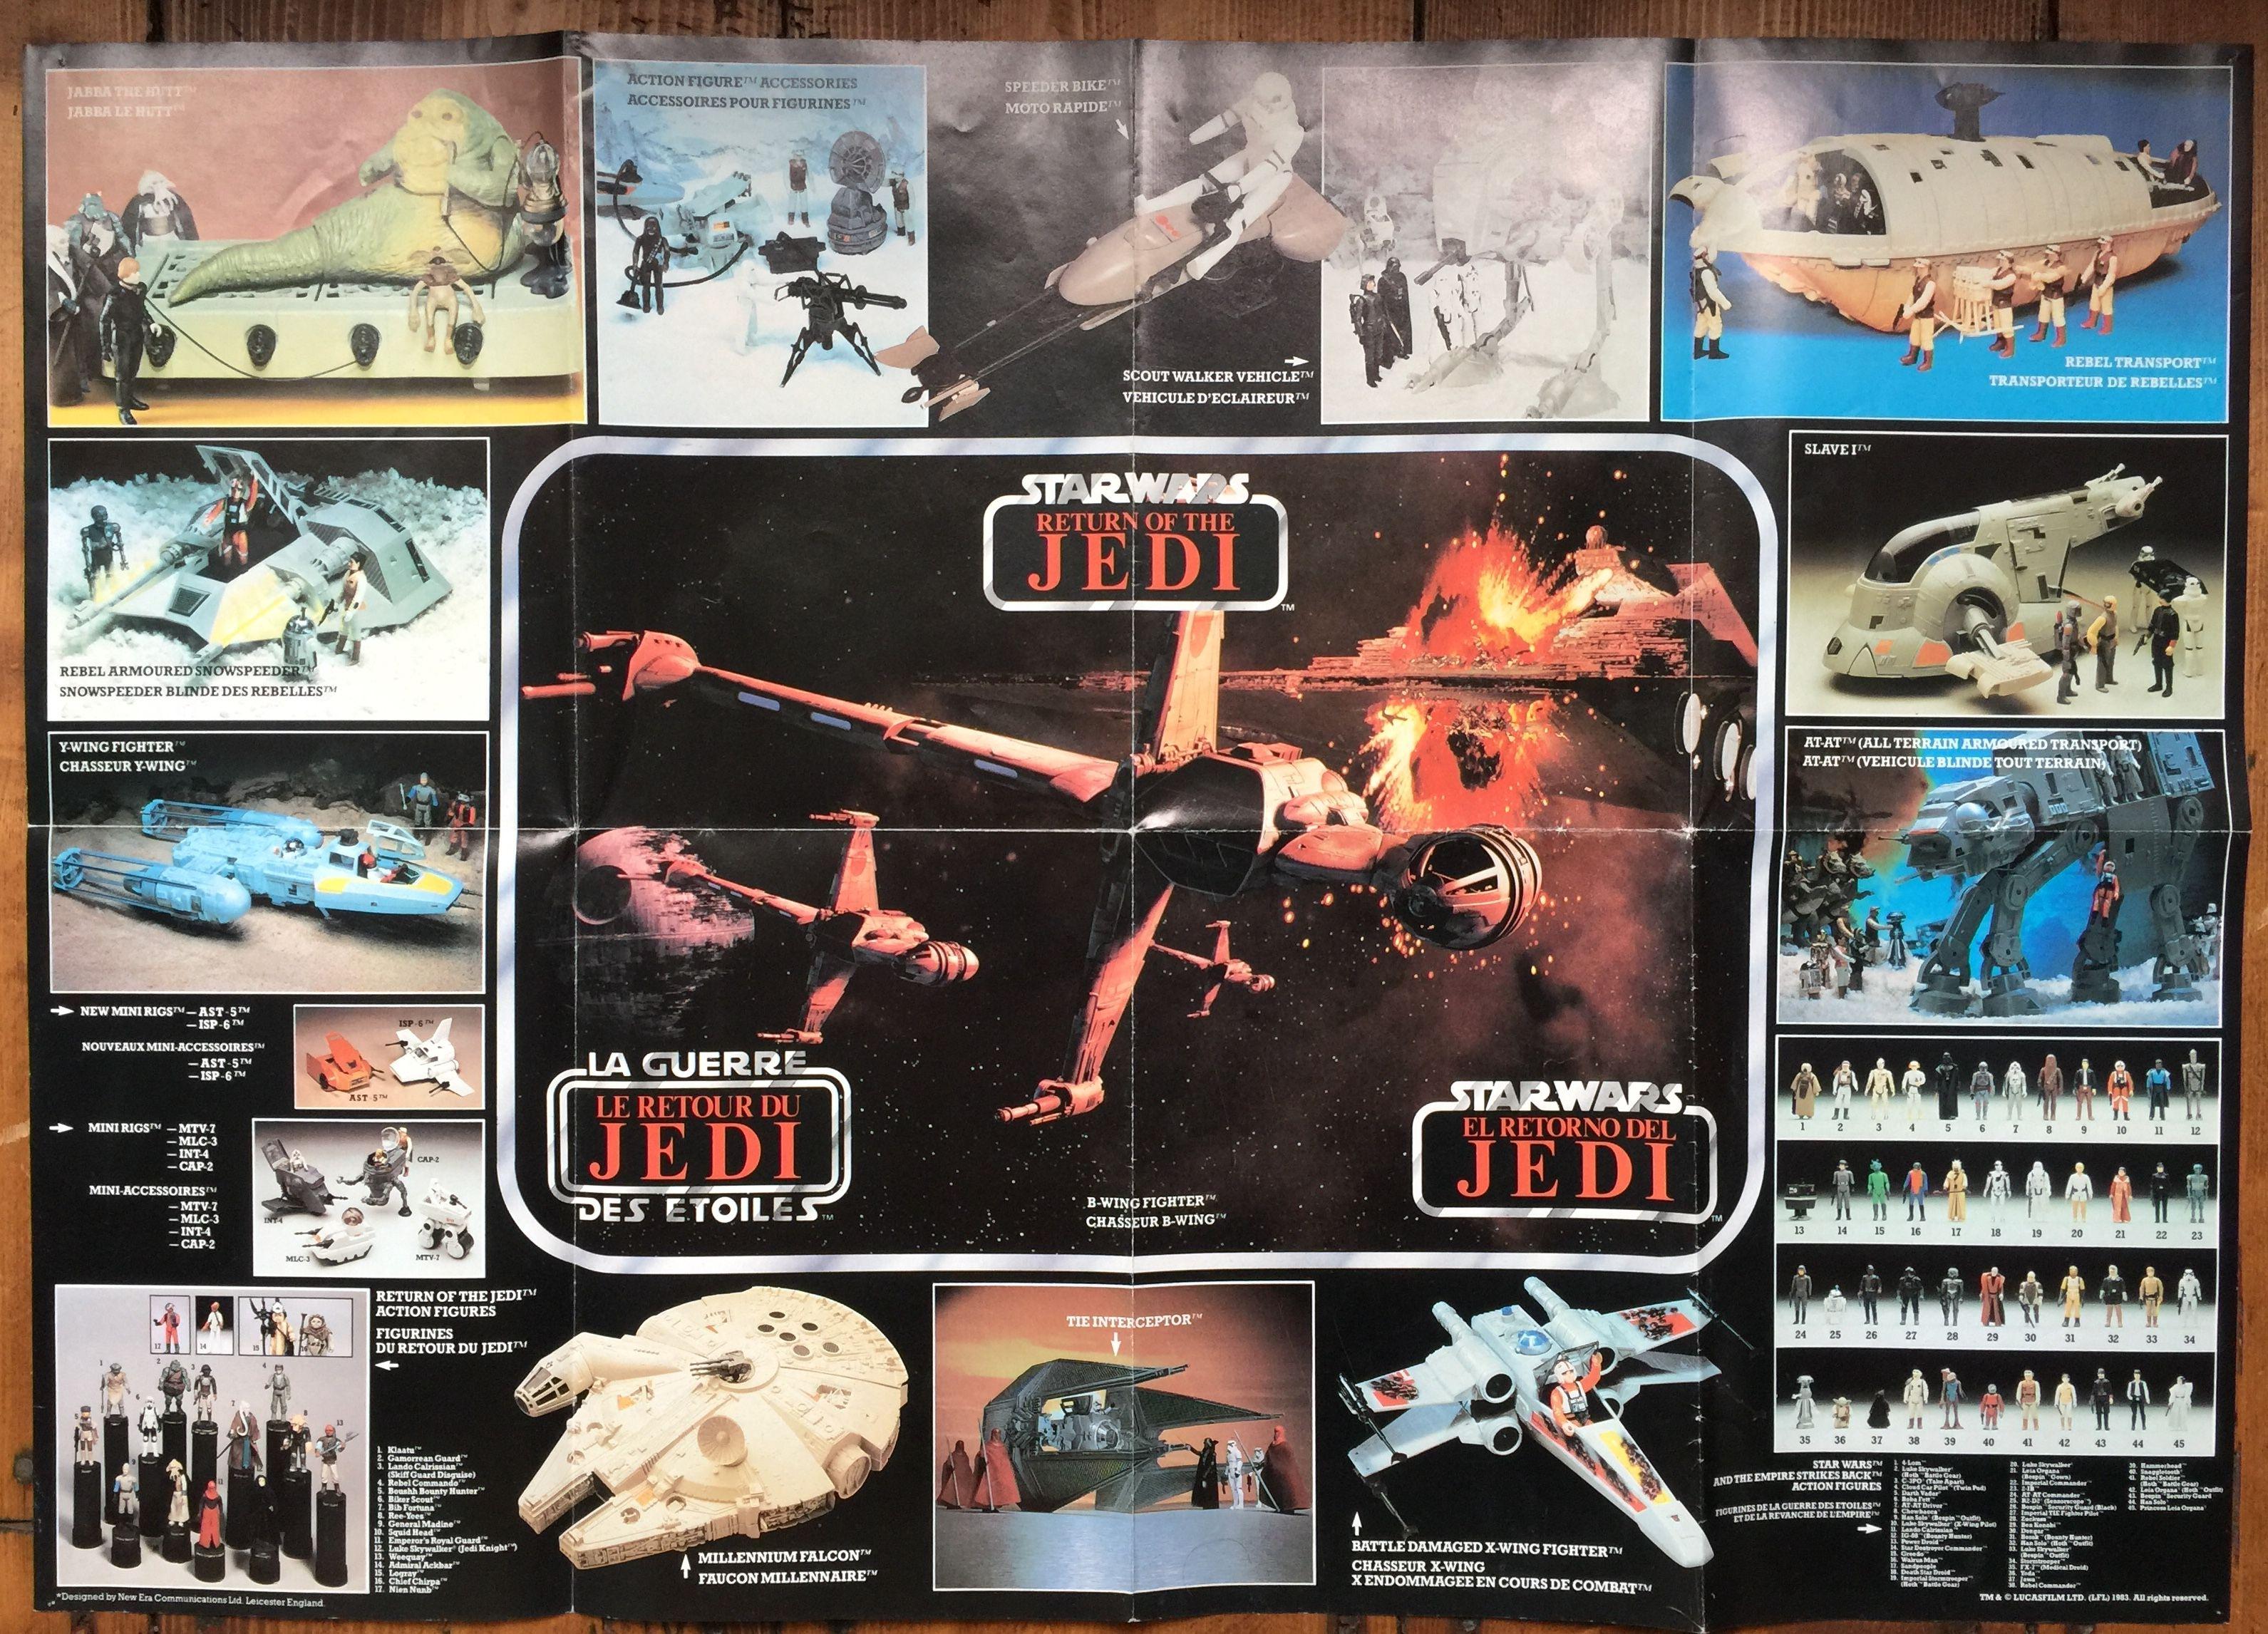 Vintage Kenner Star Wars Return Of The Jedi Toy Poster Kenshocollection Kenner Starwars Vintage Star Wars Toys Star Wars Collection Star Wars Figures